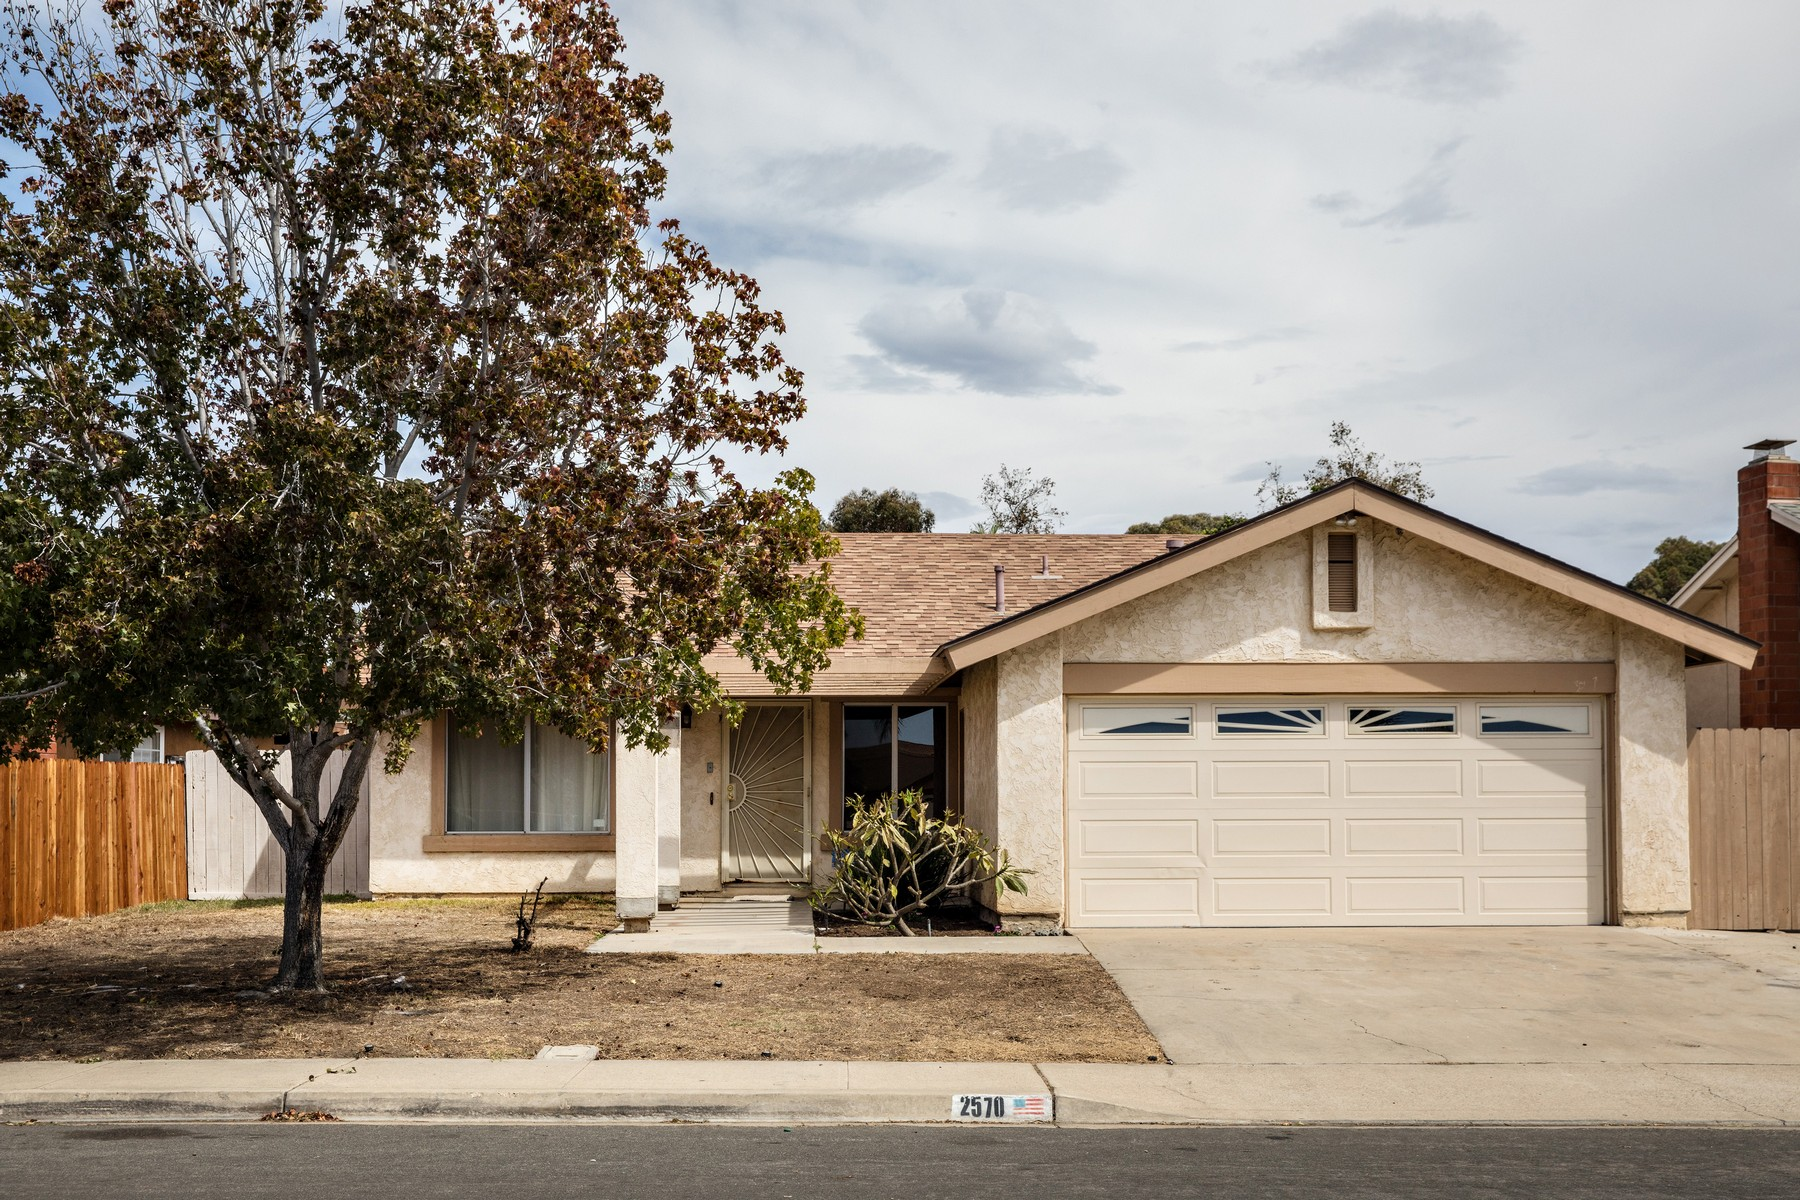 Single Family Home for Sale at 2570 Biola Avenue San Diego, California 92154 United States